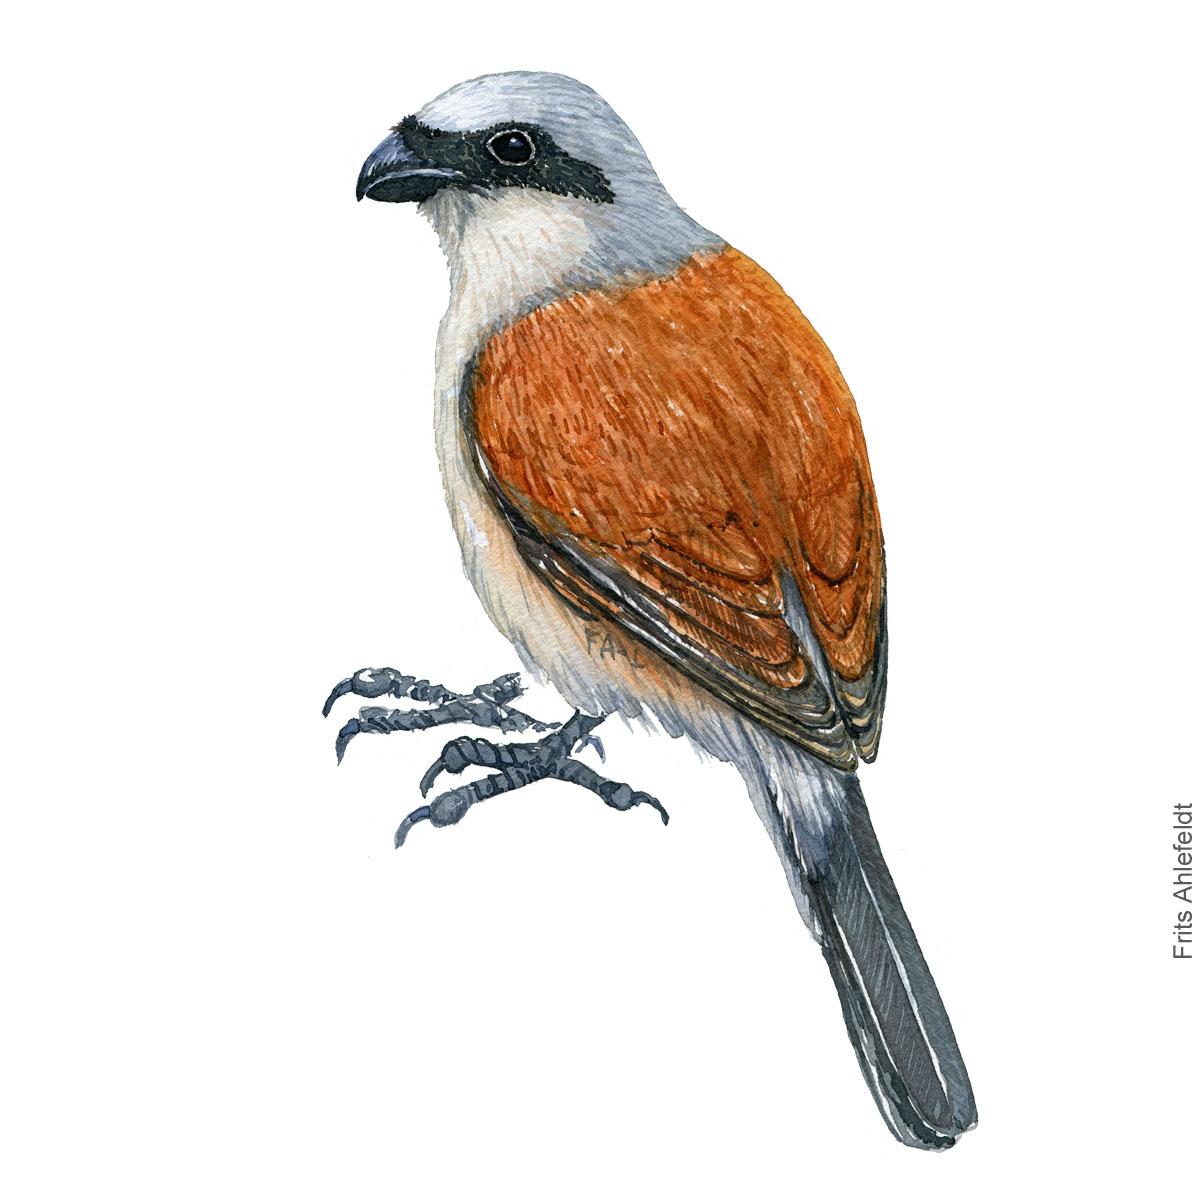 Roedrygget tornskade - Red-backed shrike - Bird painting in watercolor by Frits Ahlefeldt - Fugle akvarel